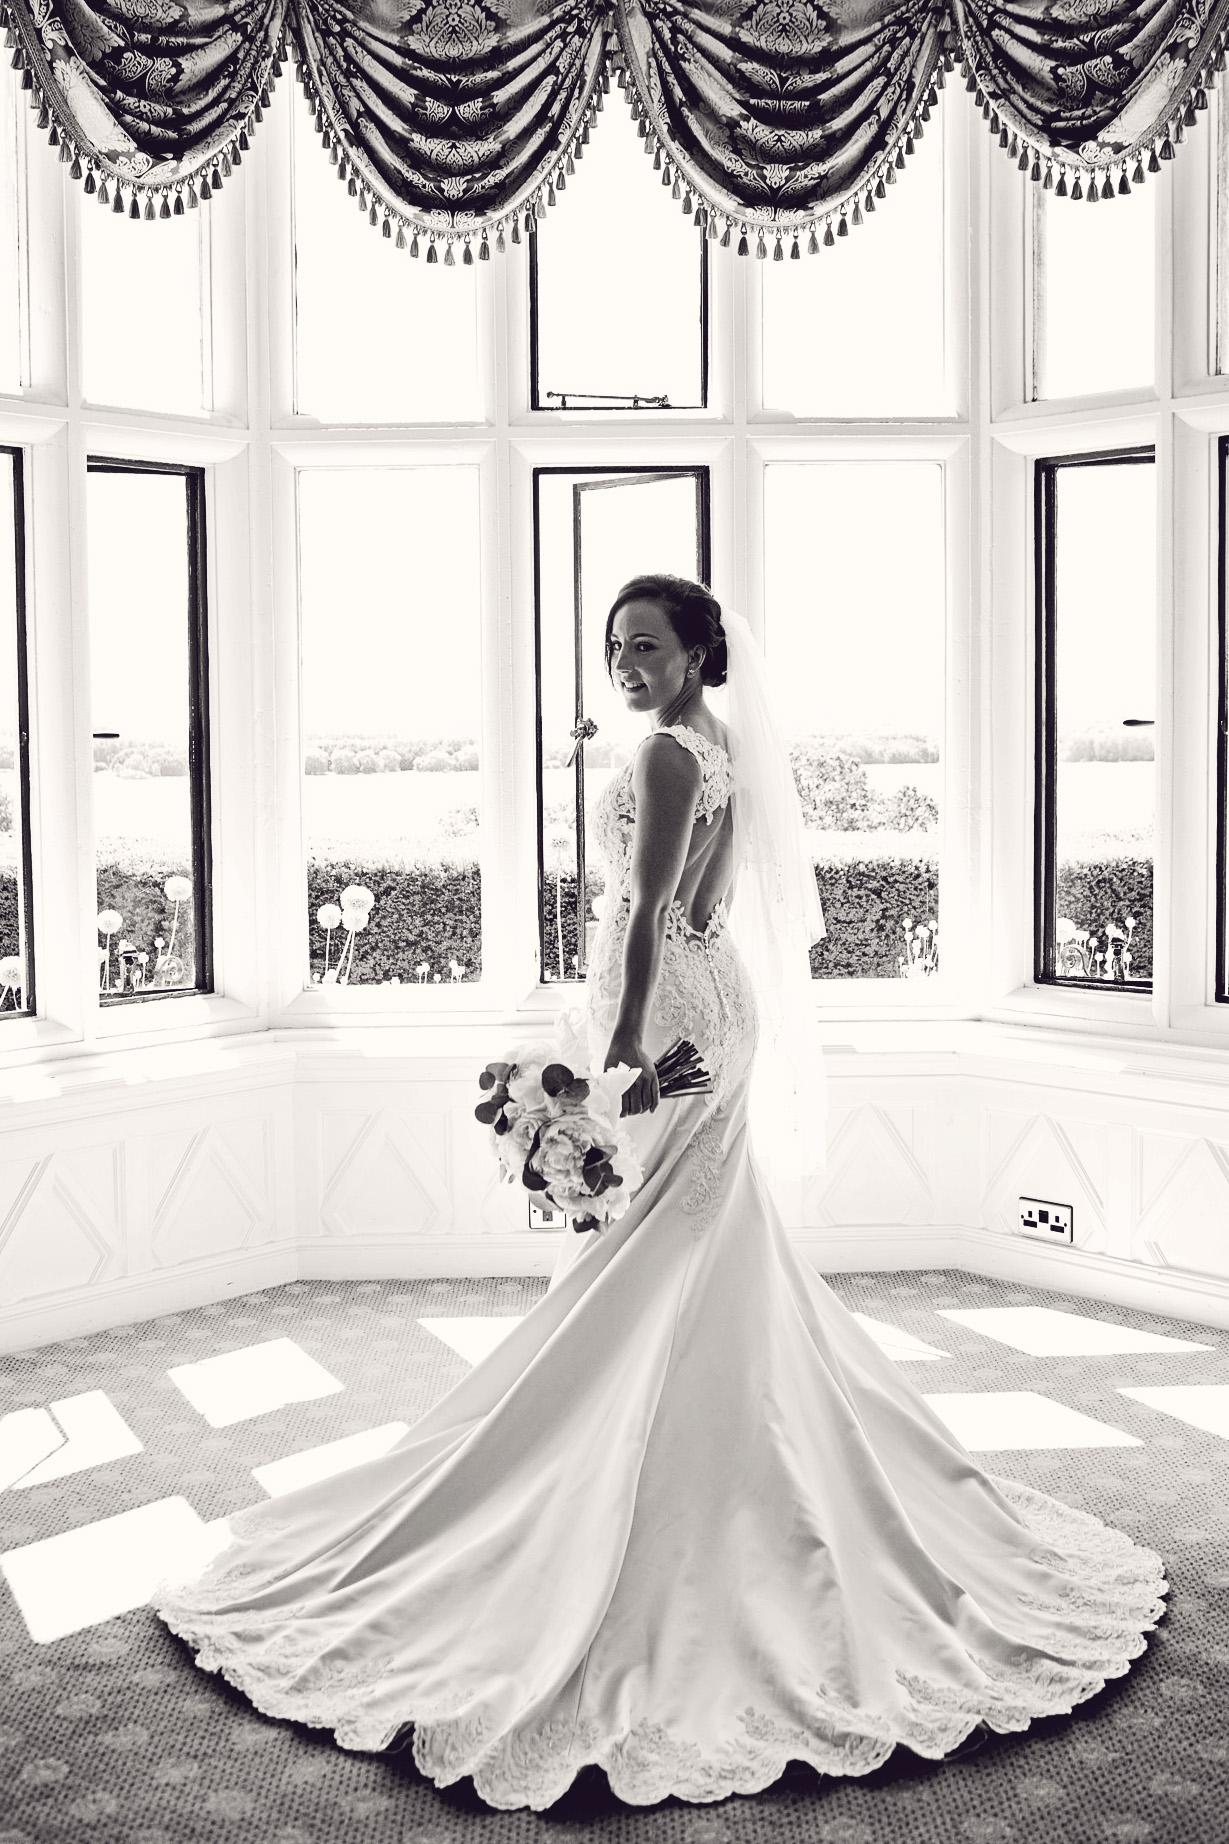 wedding-barnsdale-hall (6).jpg